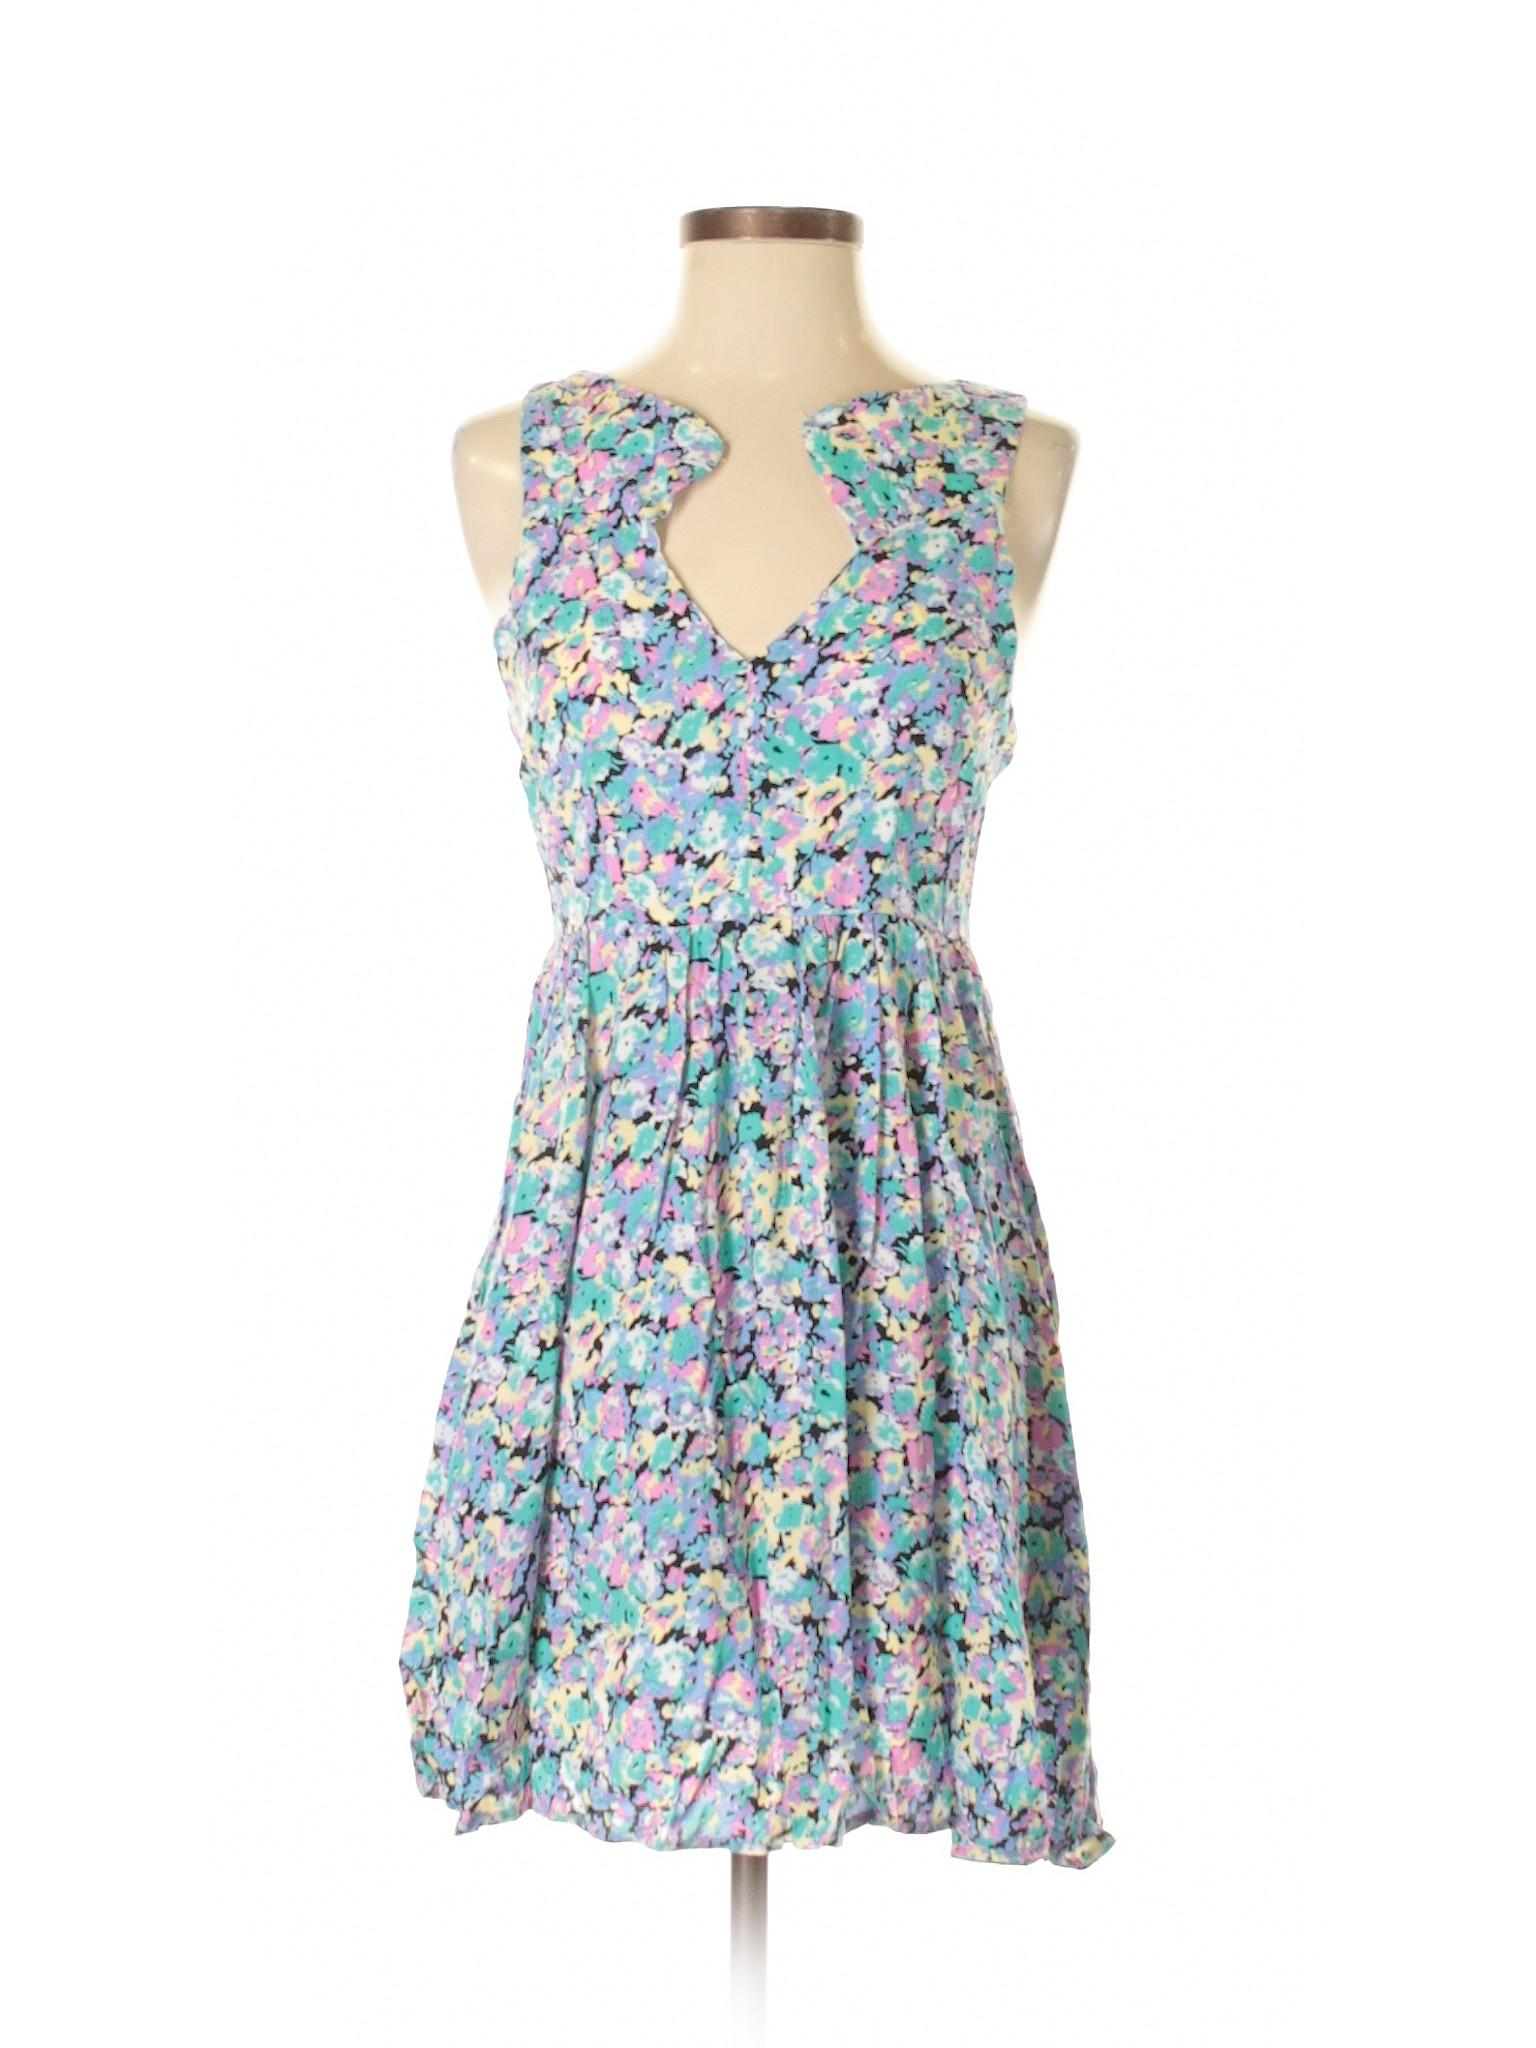 Casual Casual Selling Selling Selling TOBI Dress TOBI Dress Dress Casual TOBI Casual TOBI Selling gZaWA7Fna